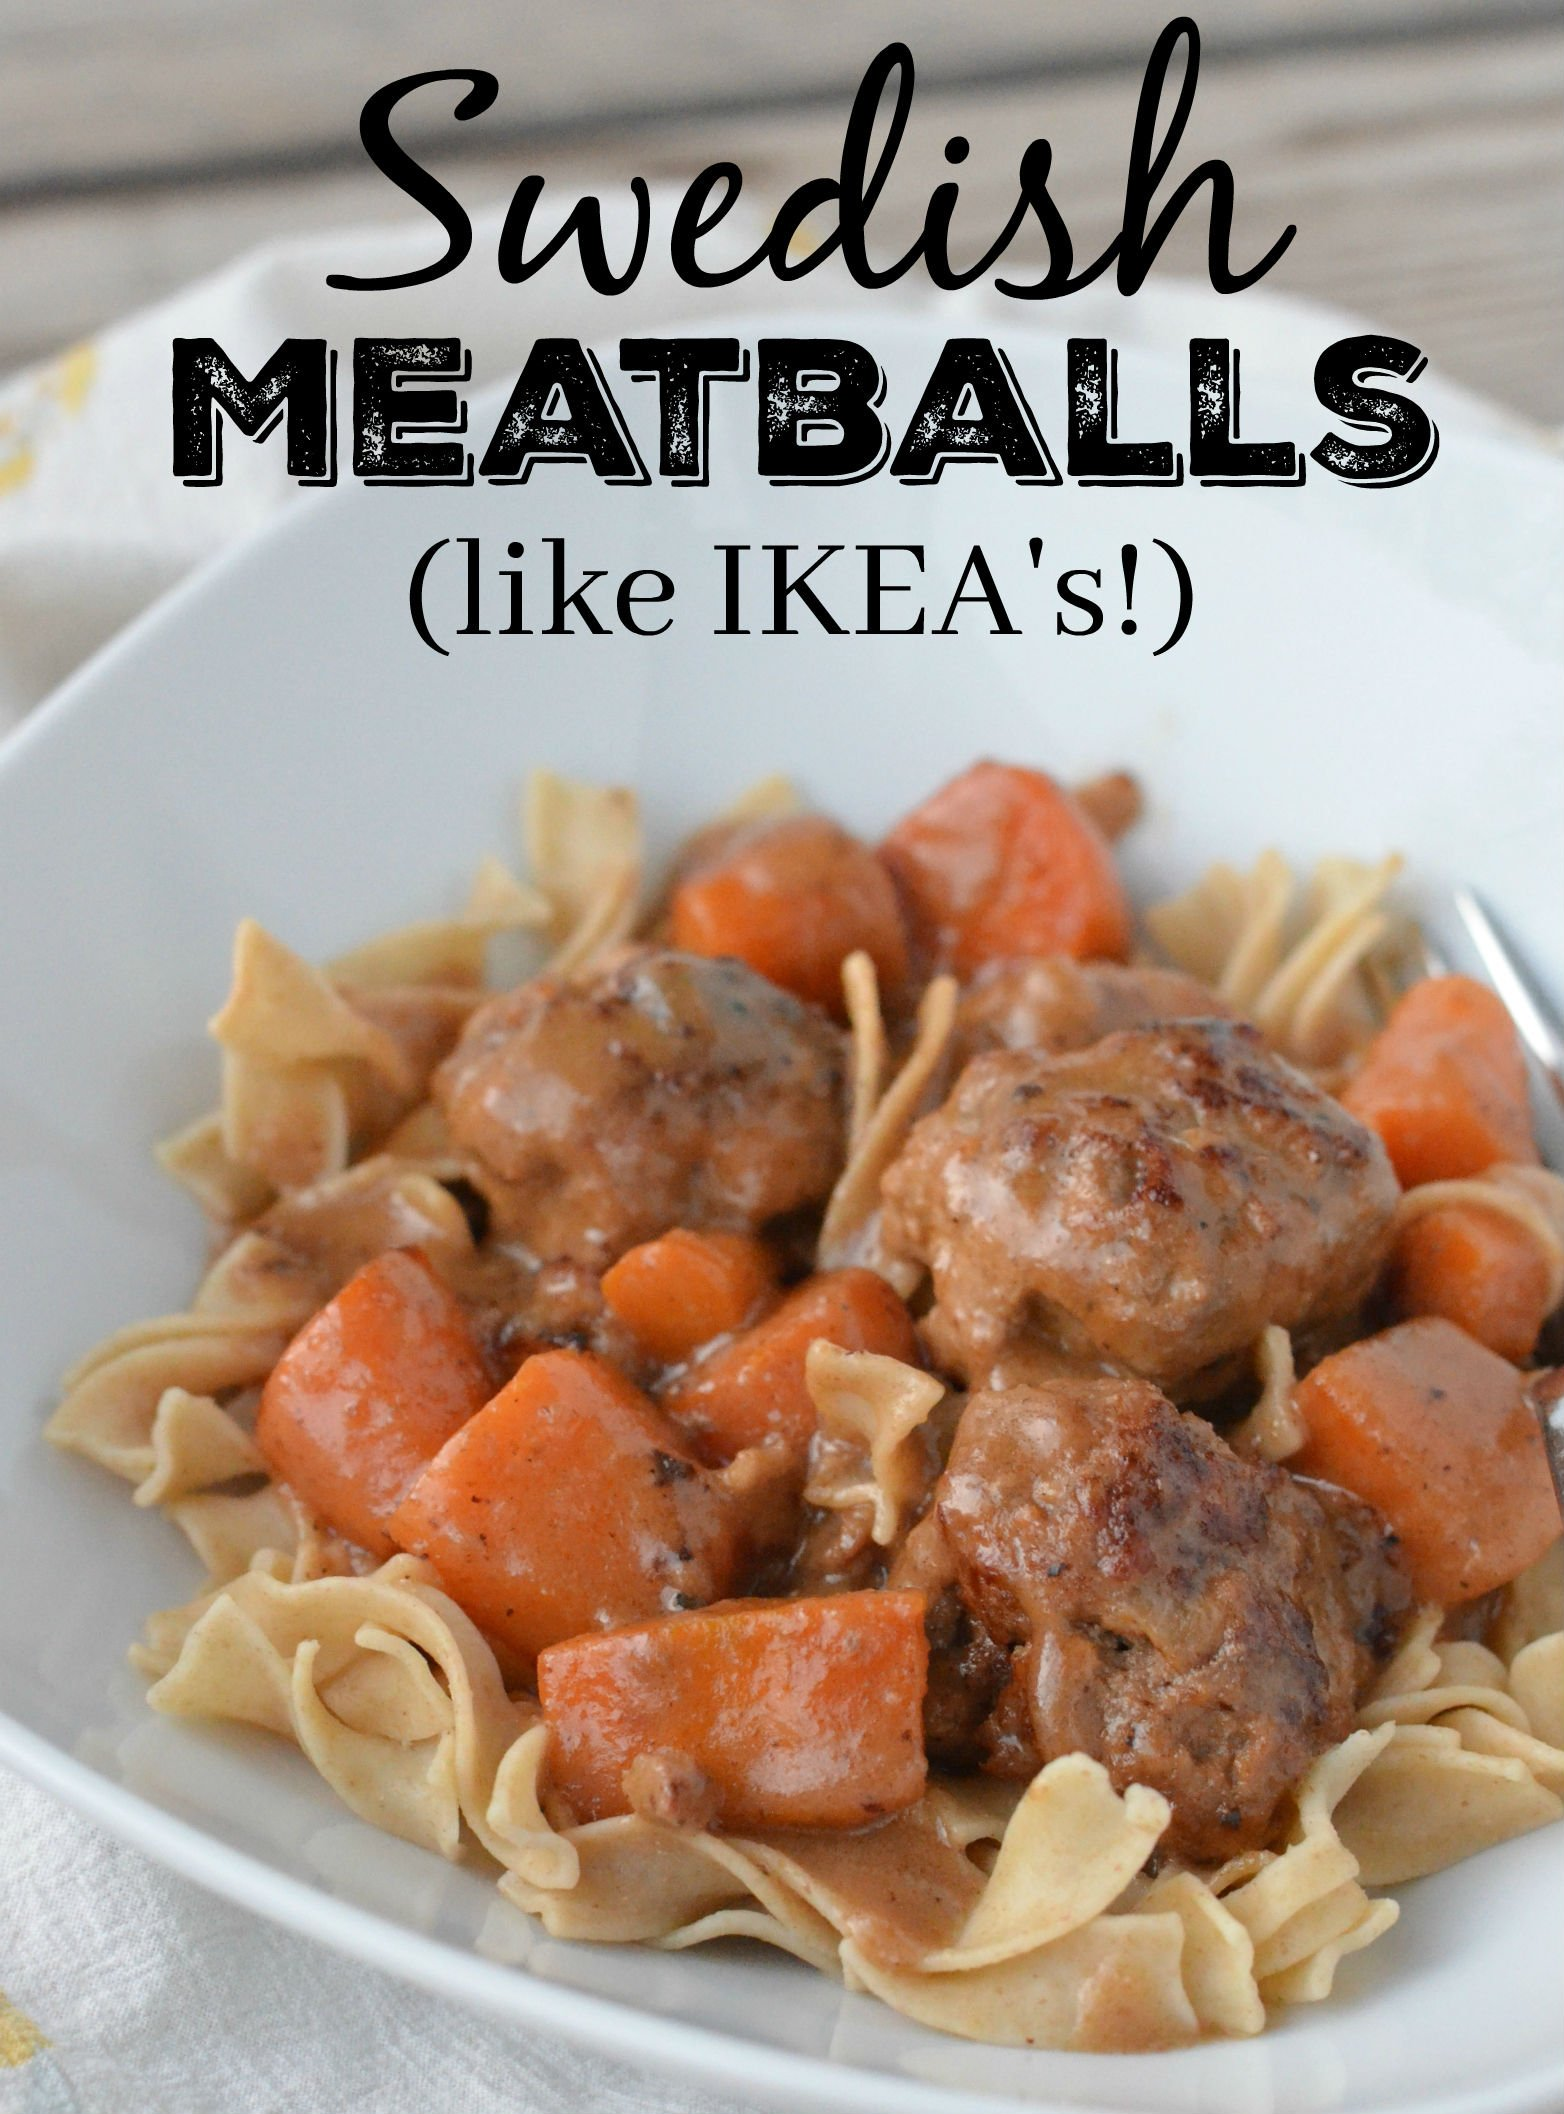 Köttbullar in der IKEA Restaurant Spreisekarte